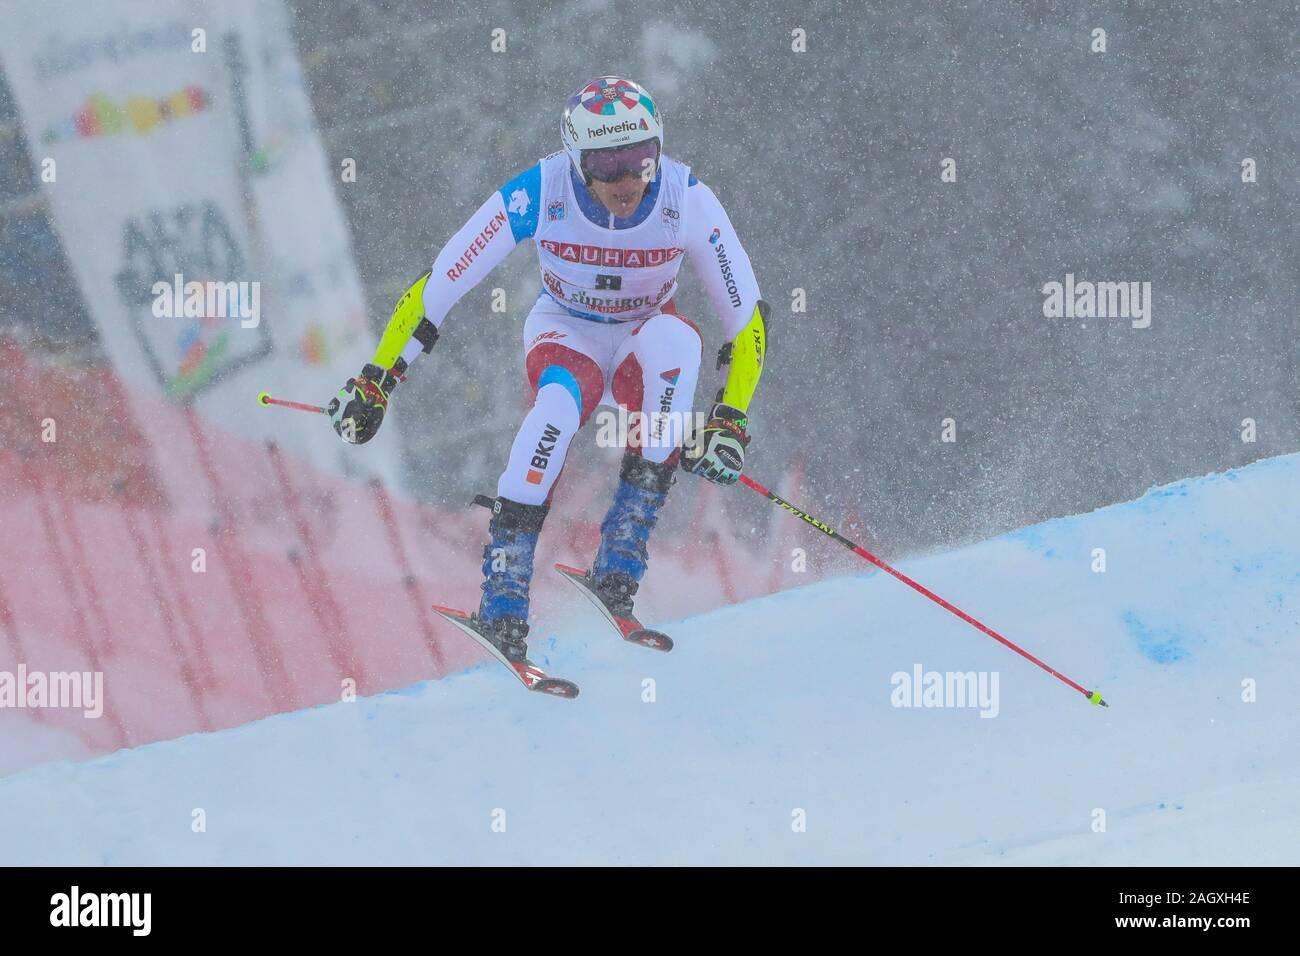 Alta Badia, Italy. 22nd Dec, 2019. odermatt marco (sui) 5th classifiedduring FIS SKI WORLD CUP 2019 - Giant Slalom Men, Ski in Alta Badia, Italy, December 22 2019 - LPS/Sergio Bisi Credit: Sergio Bisi/LPS/ZUMA Wire/Alamy Live News Stock Photo